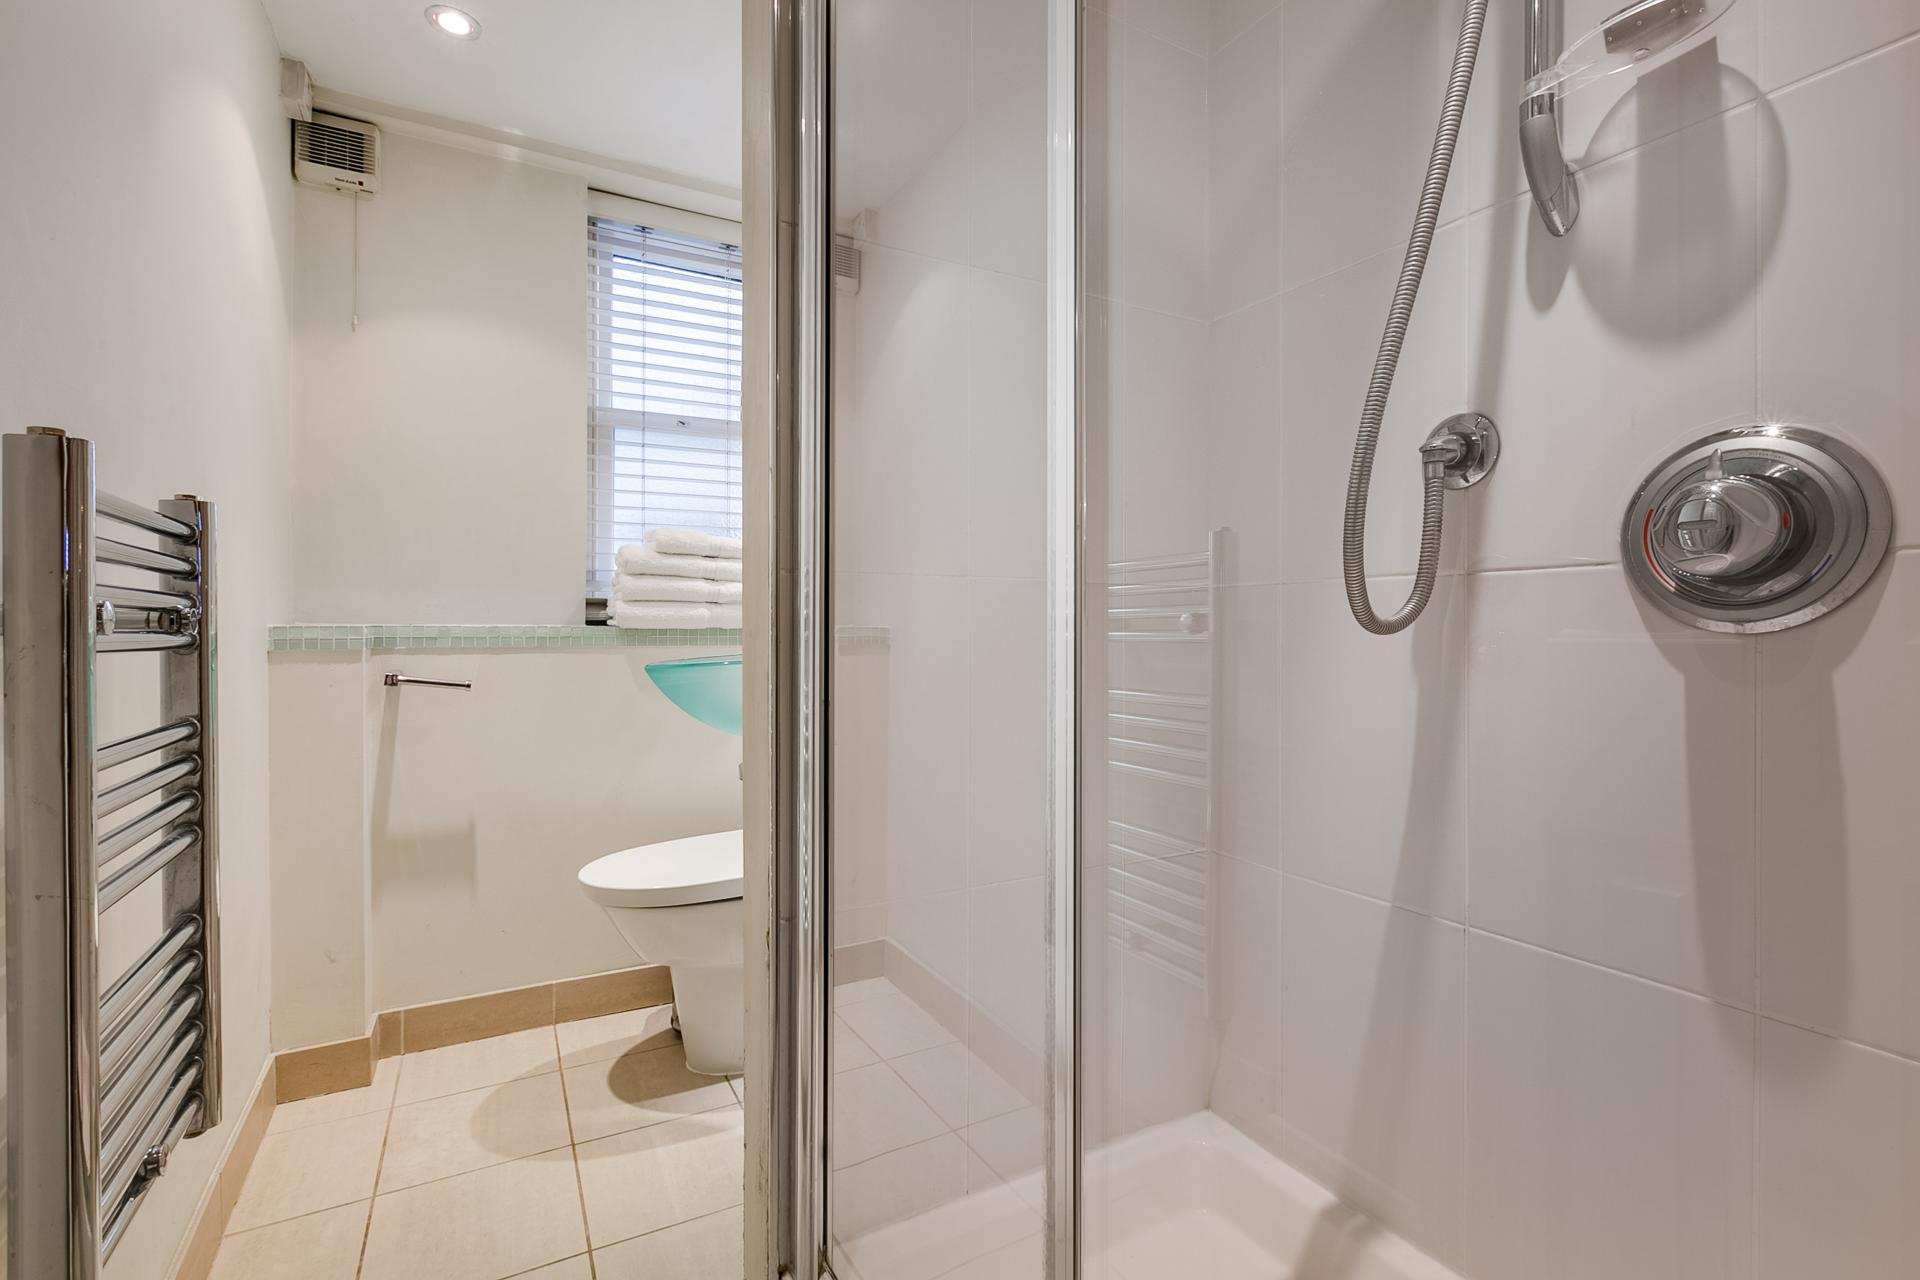 Bathroom at 54 James Street Apartment - Citybase Apartments